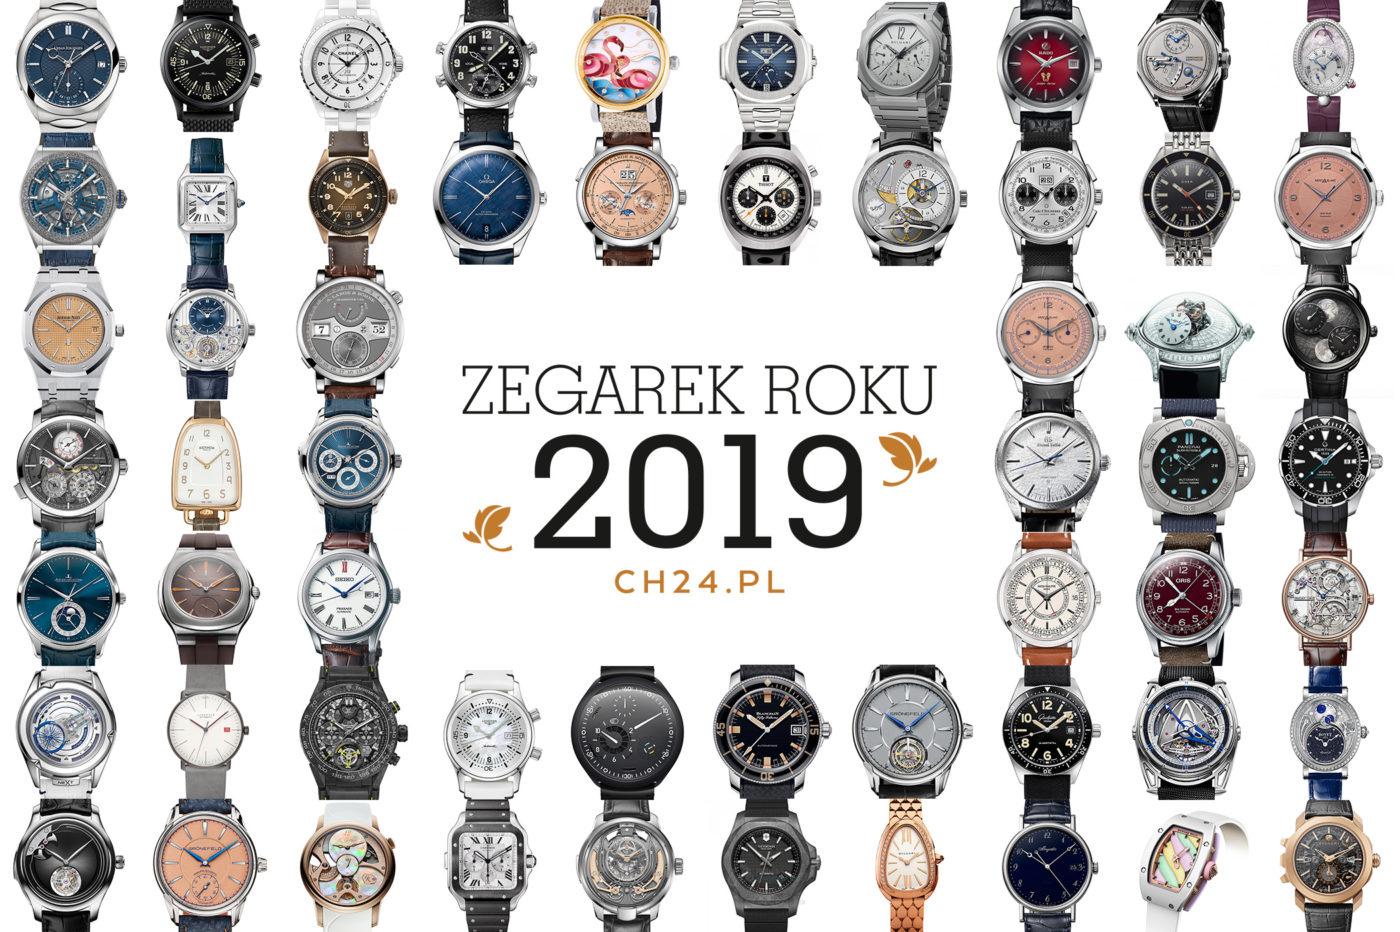 Zegarek Roku 2019 – 10. edycja(!)